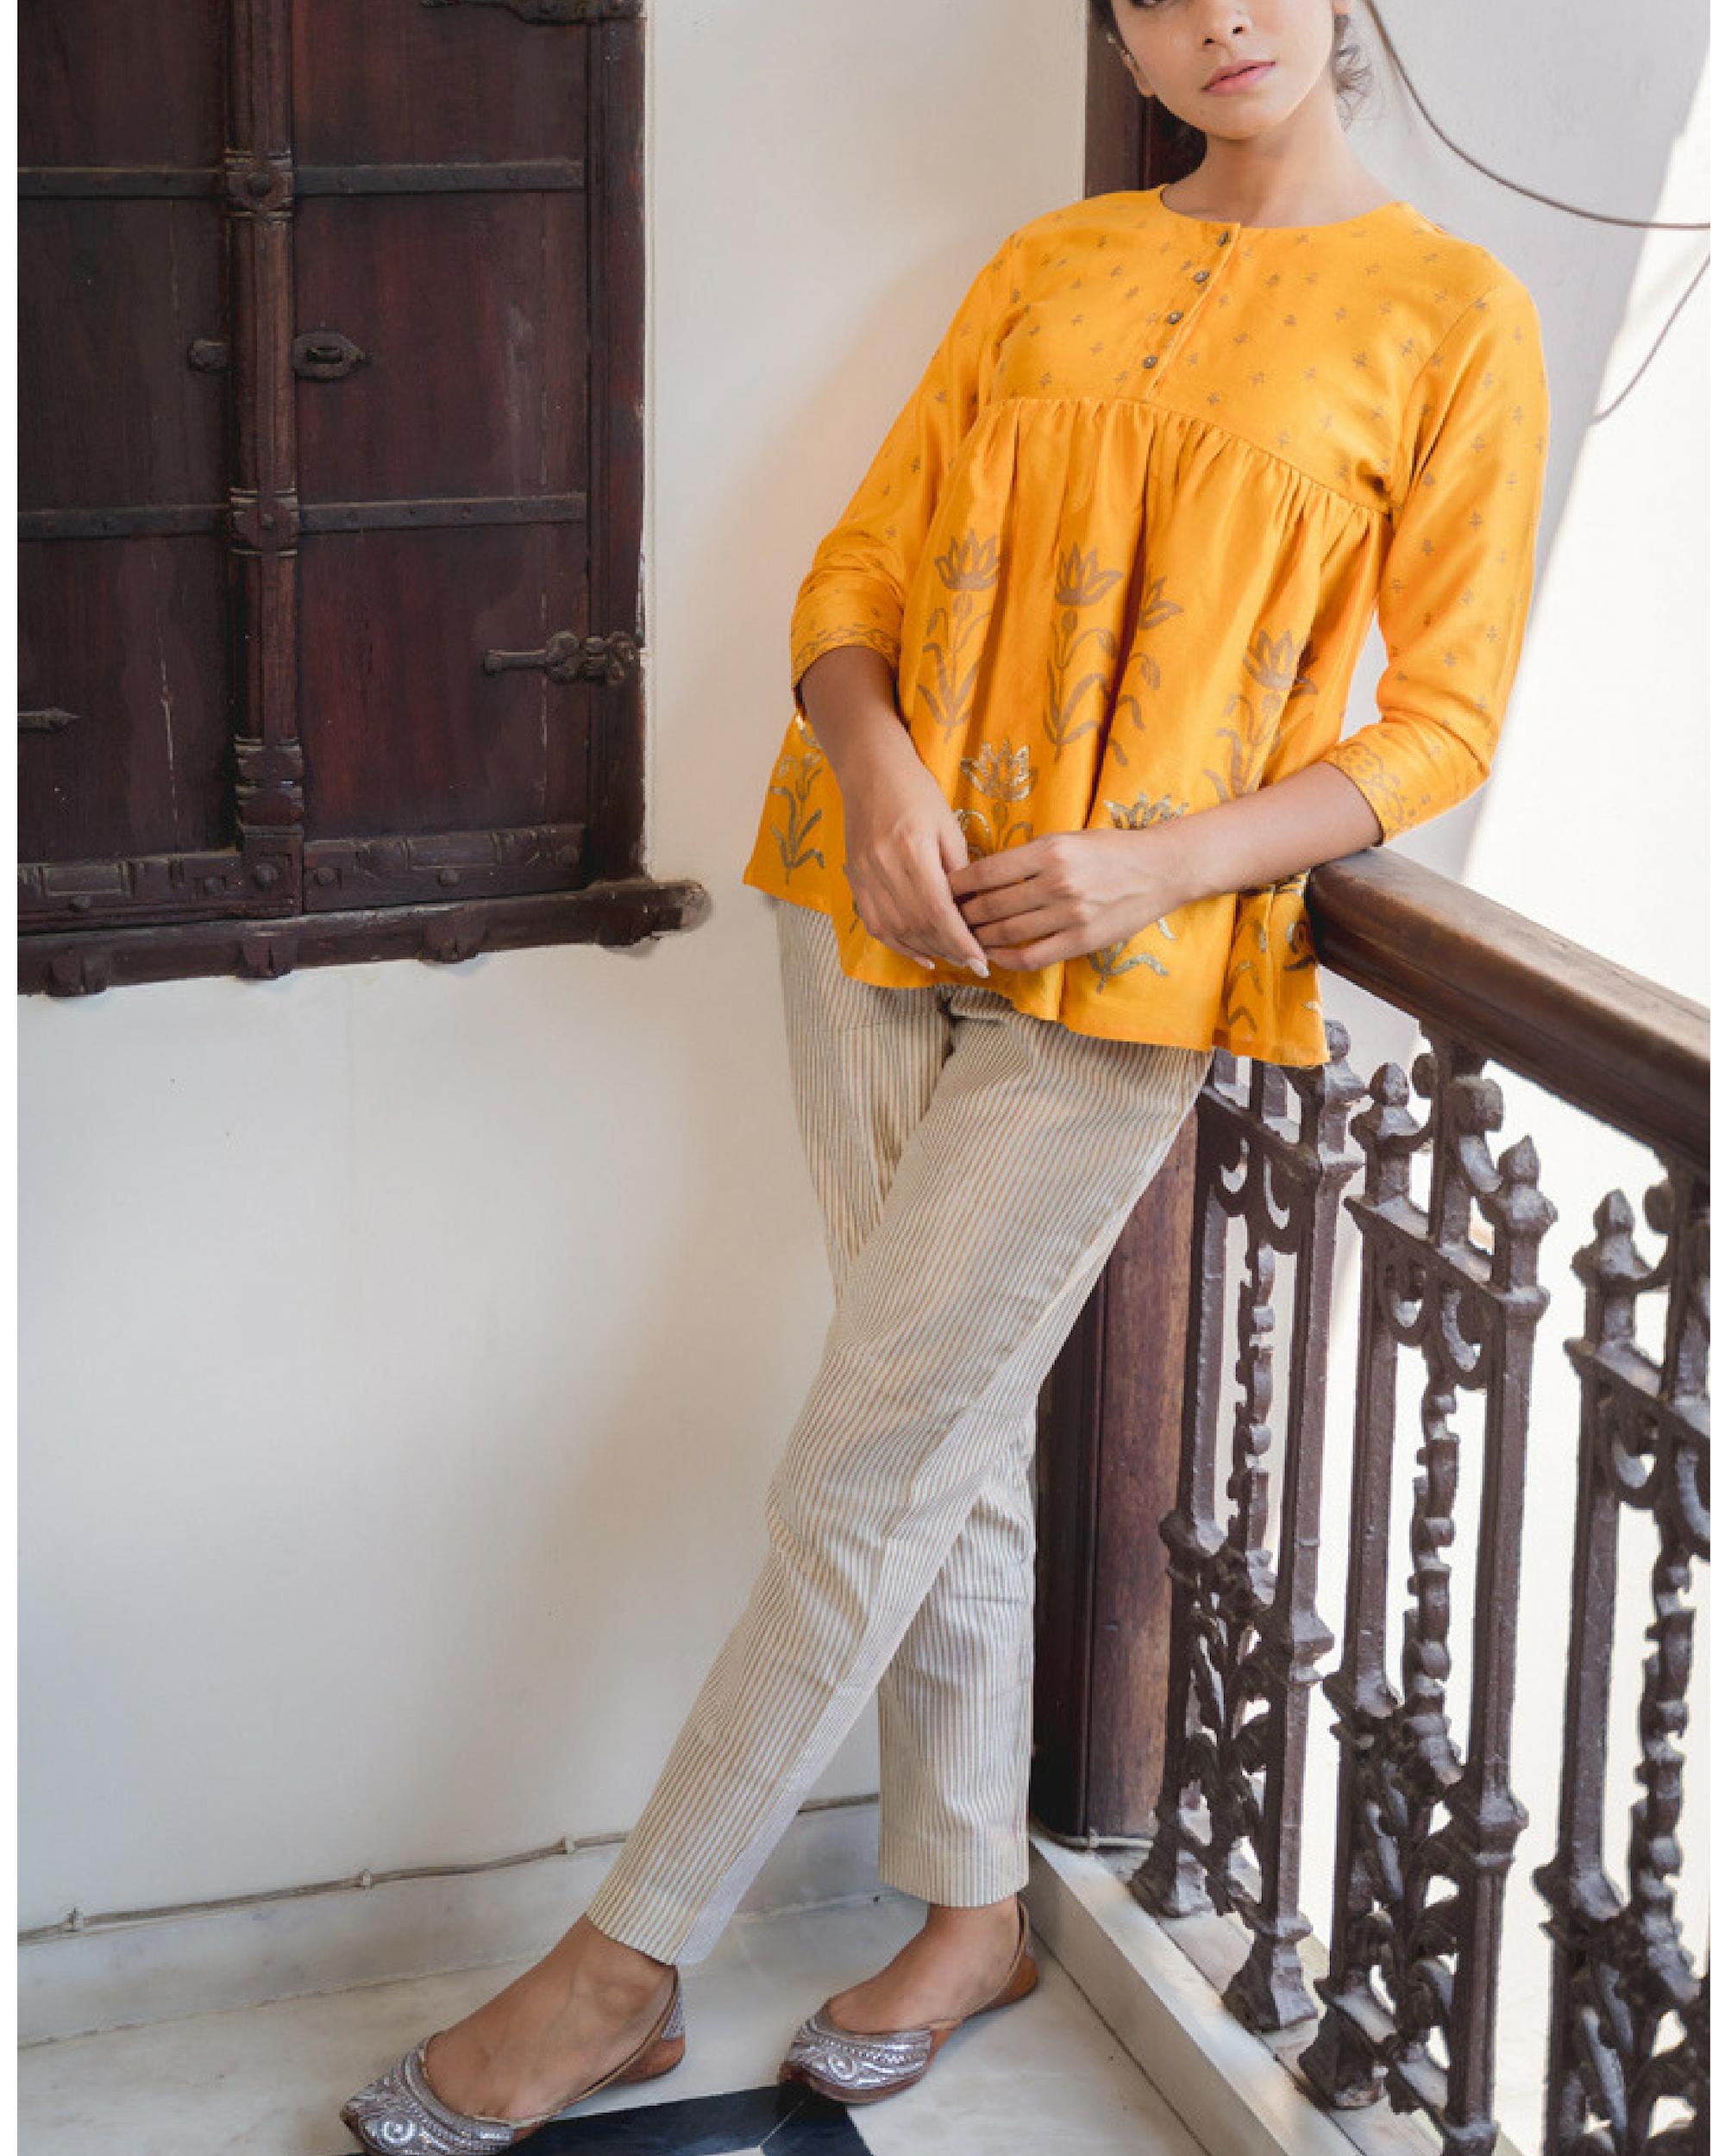 Peela chanderi top with pants